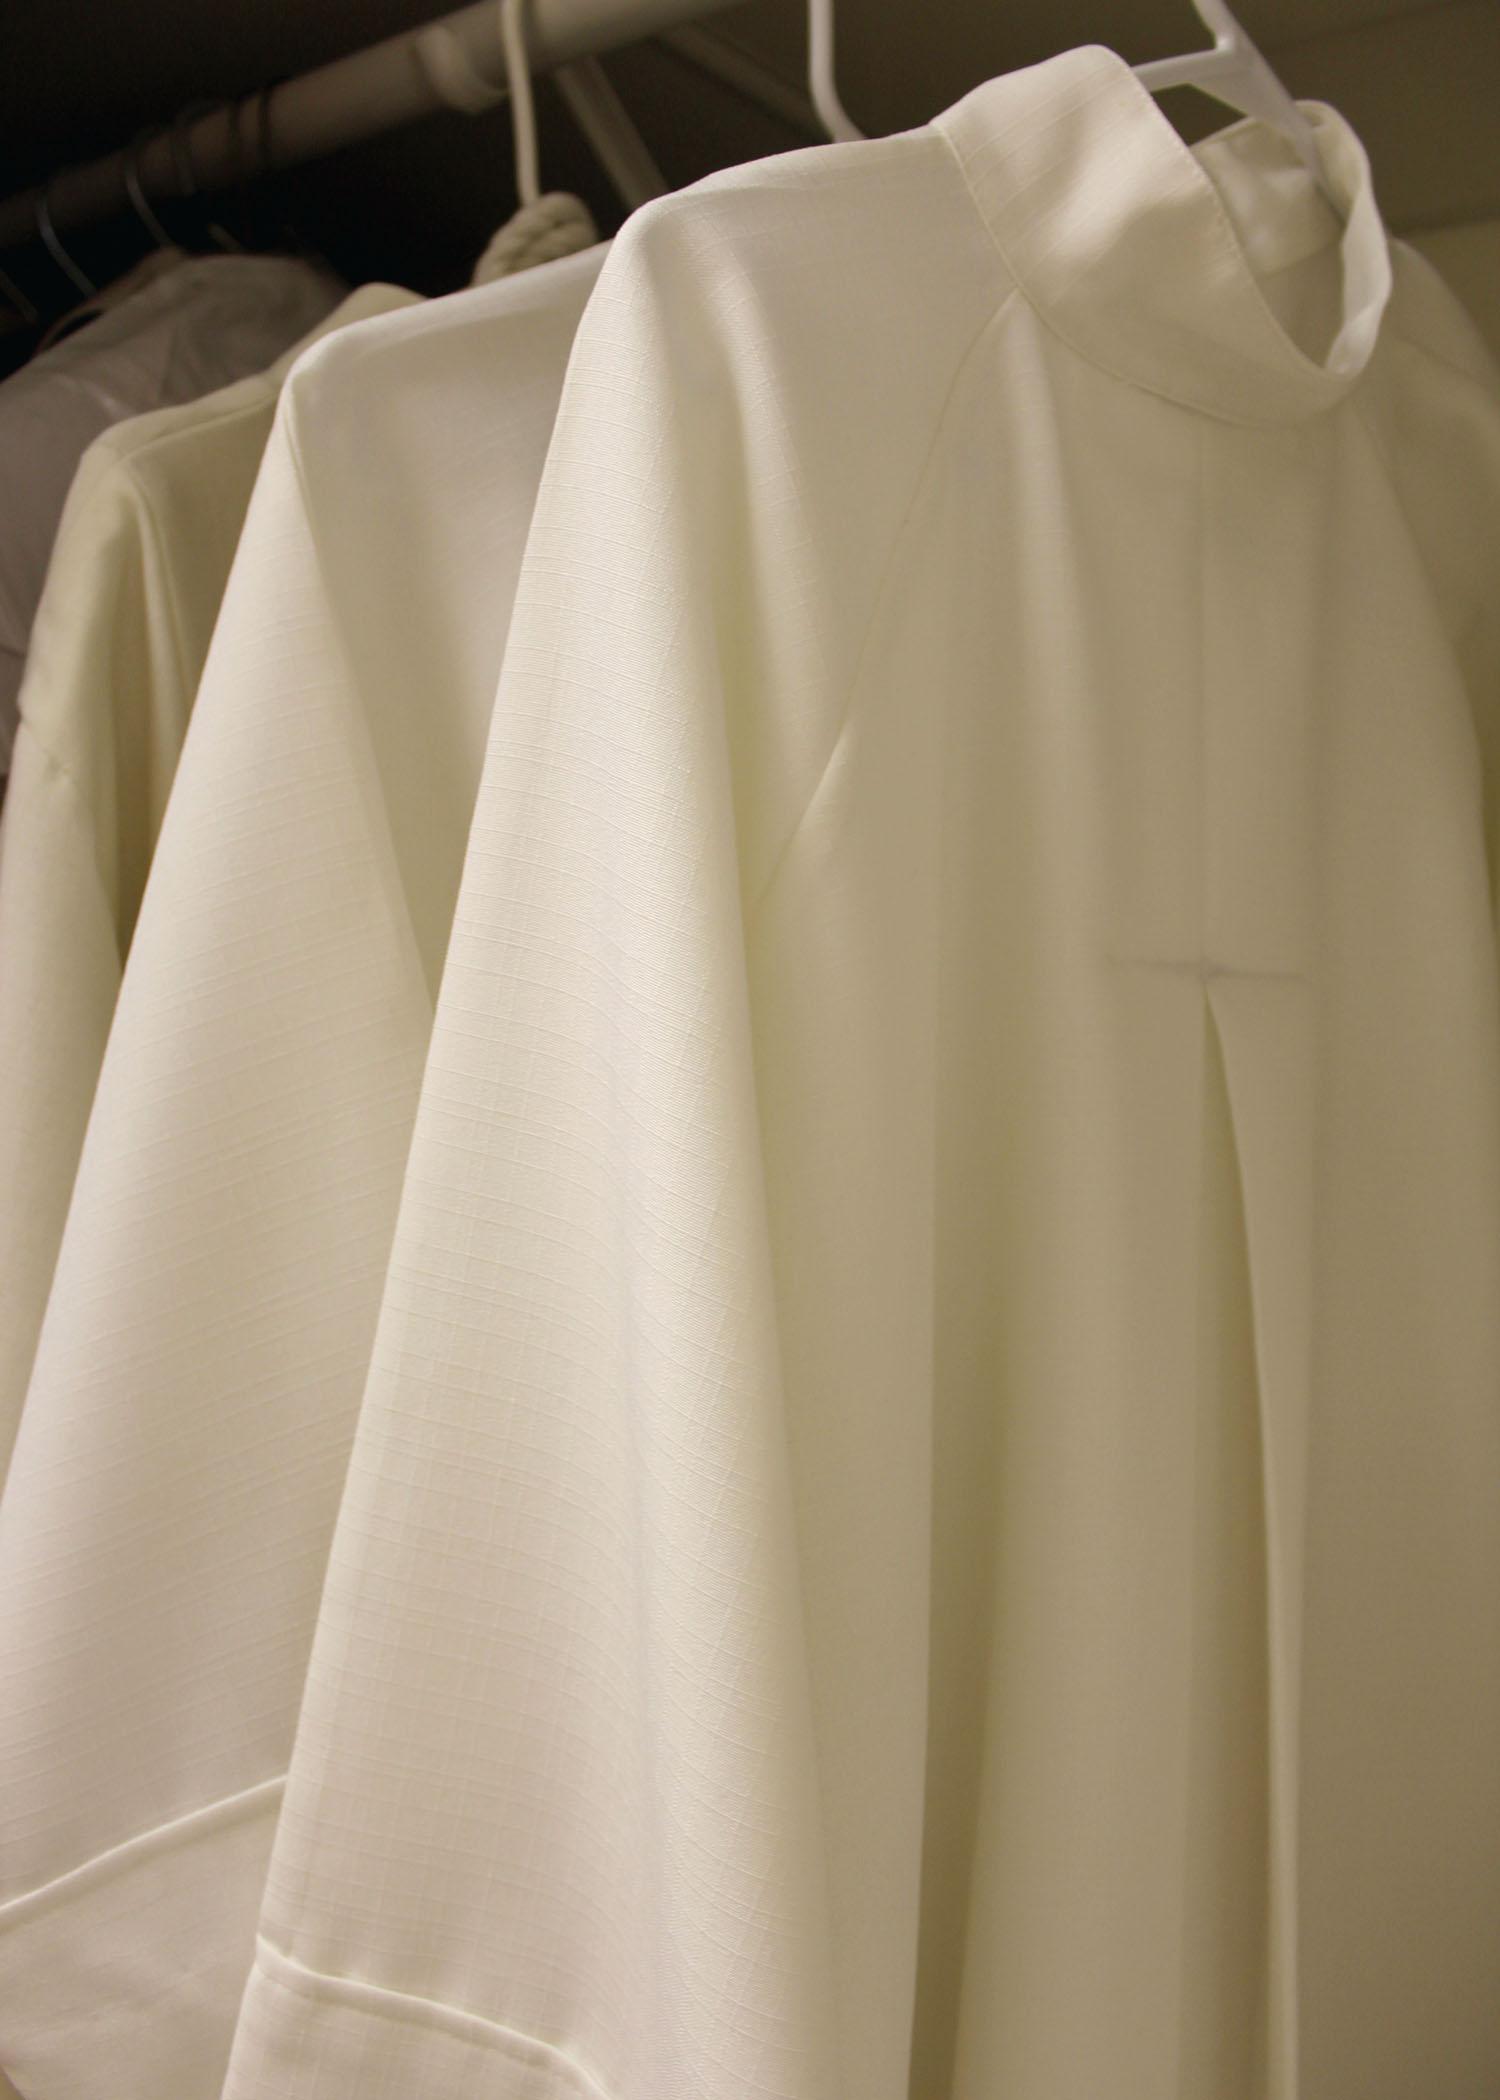 robes_13319bc.jpg